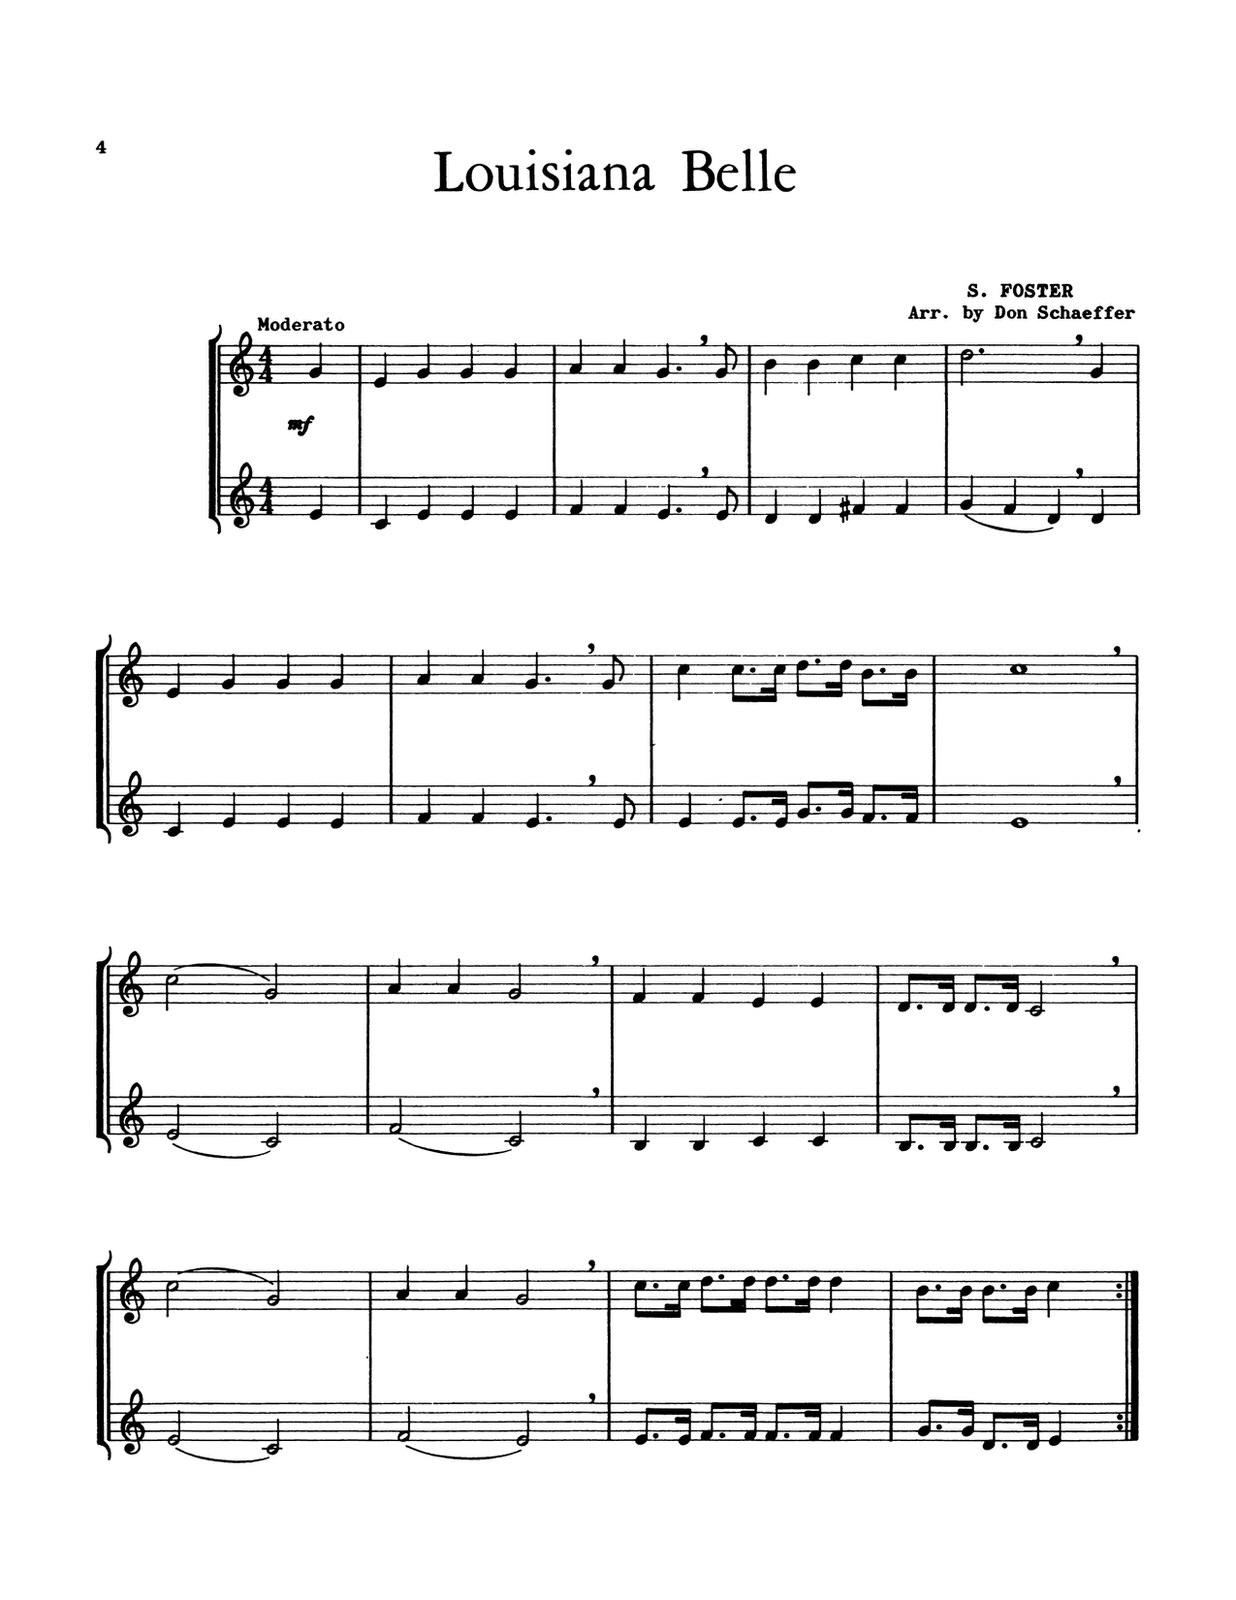 Schaeffer, Don, 21 Rhythmic Duets 2